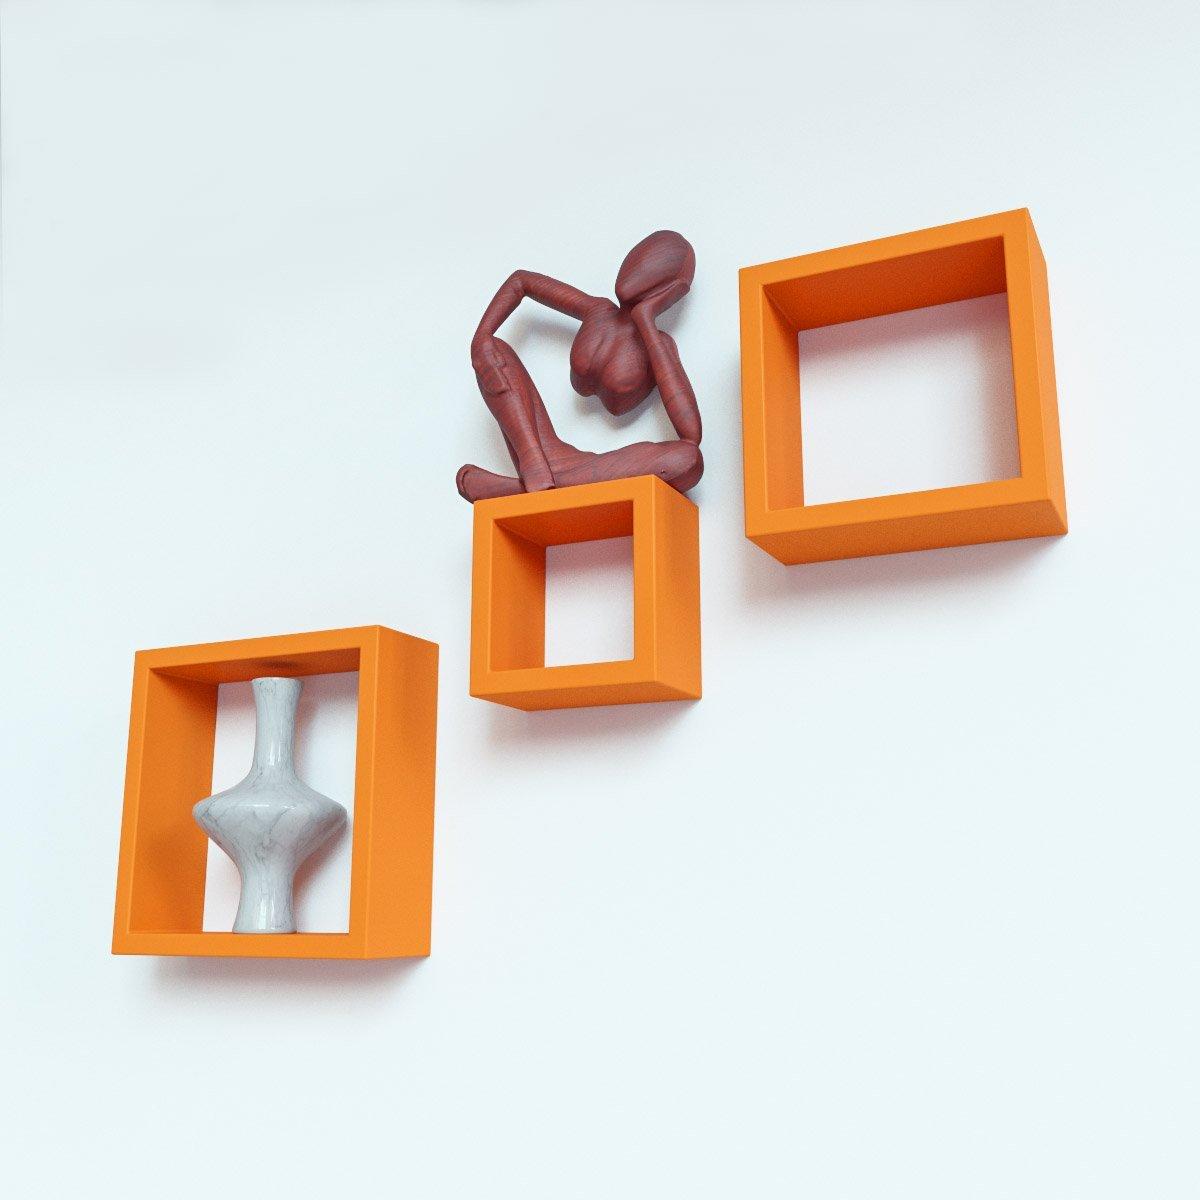 home decor square orange wall racks in set of 3